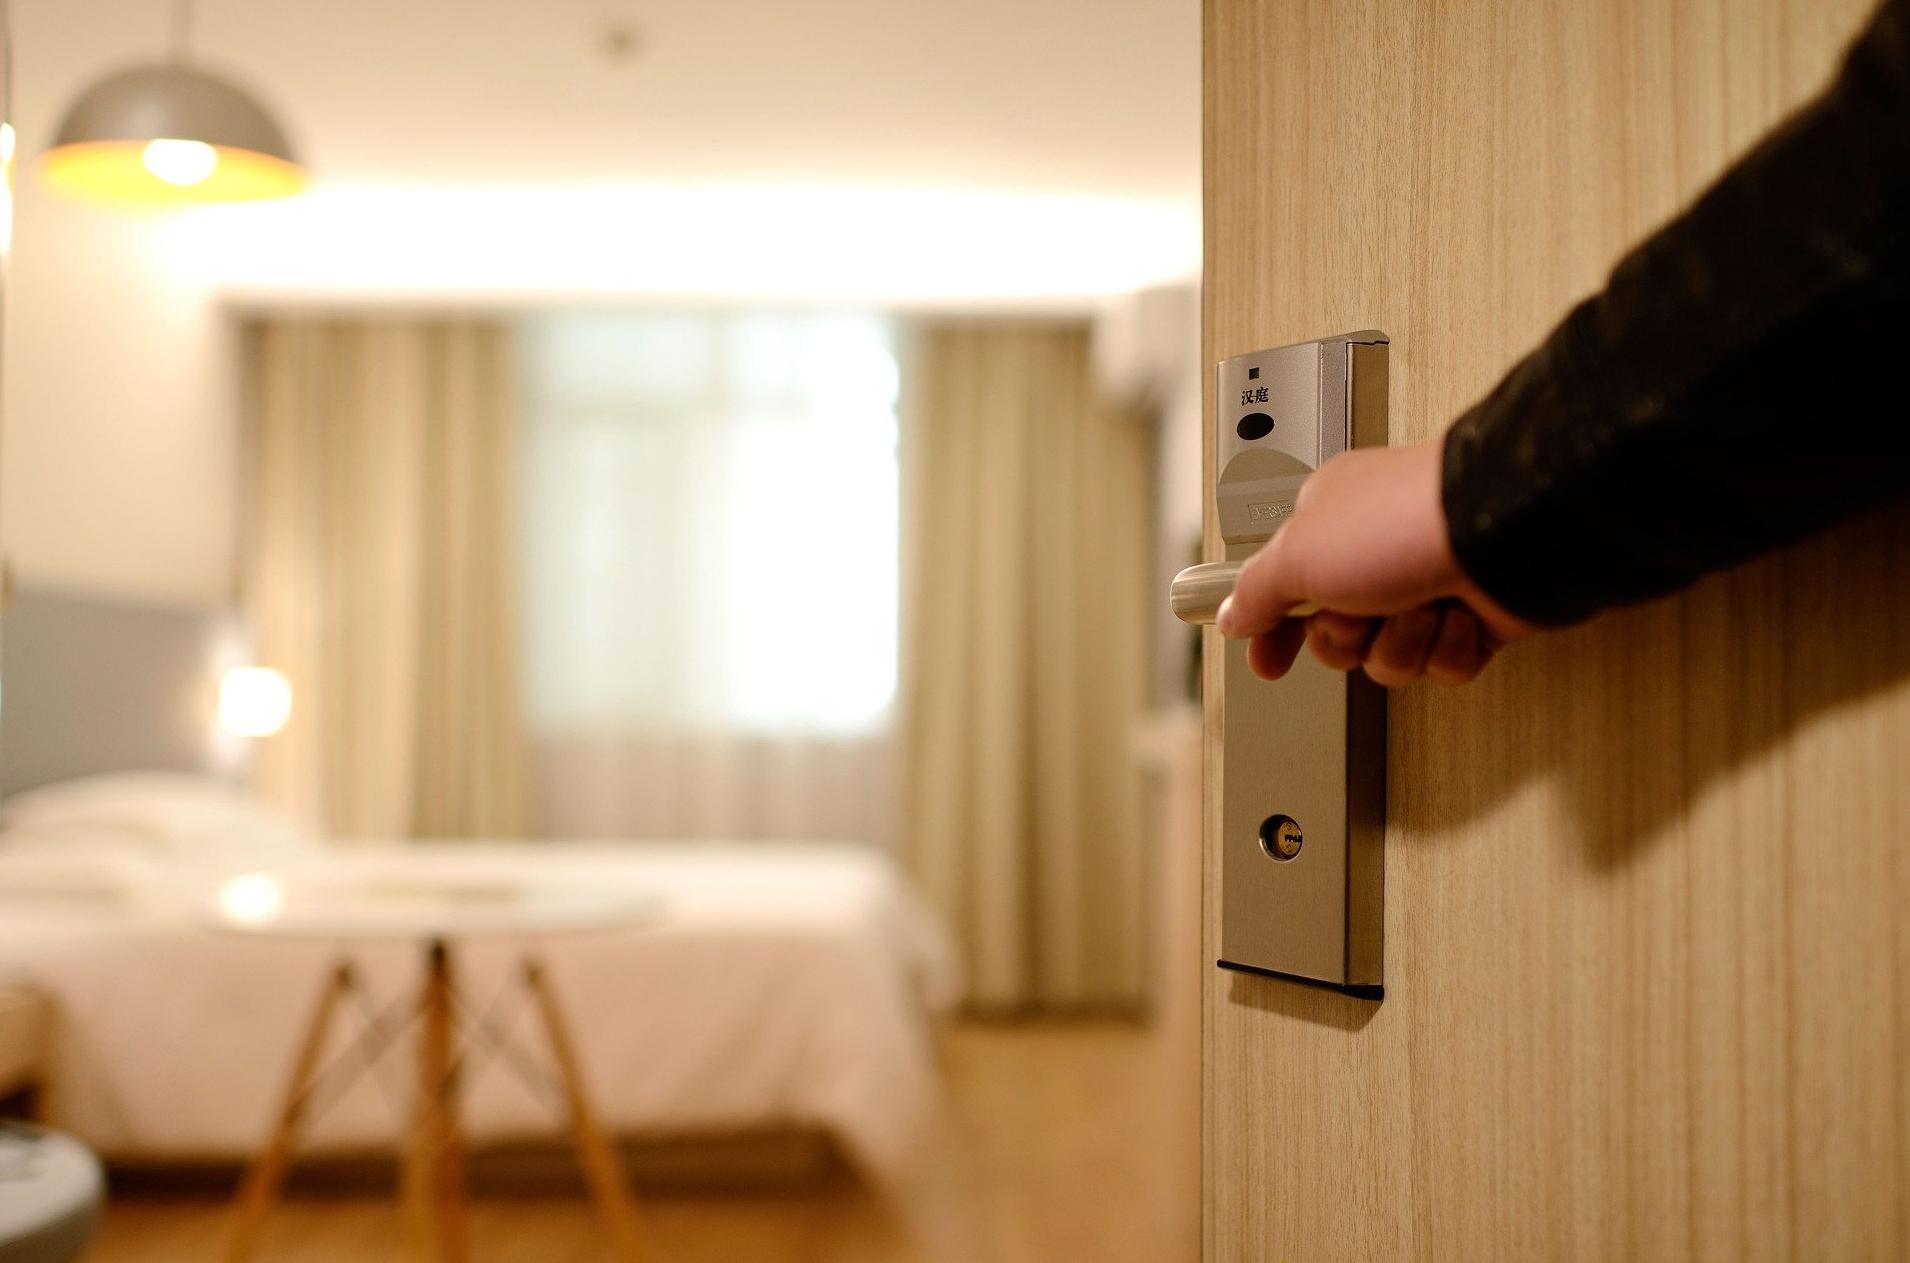 Hotel & Travel Industry